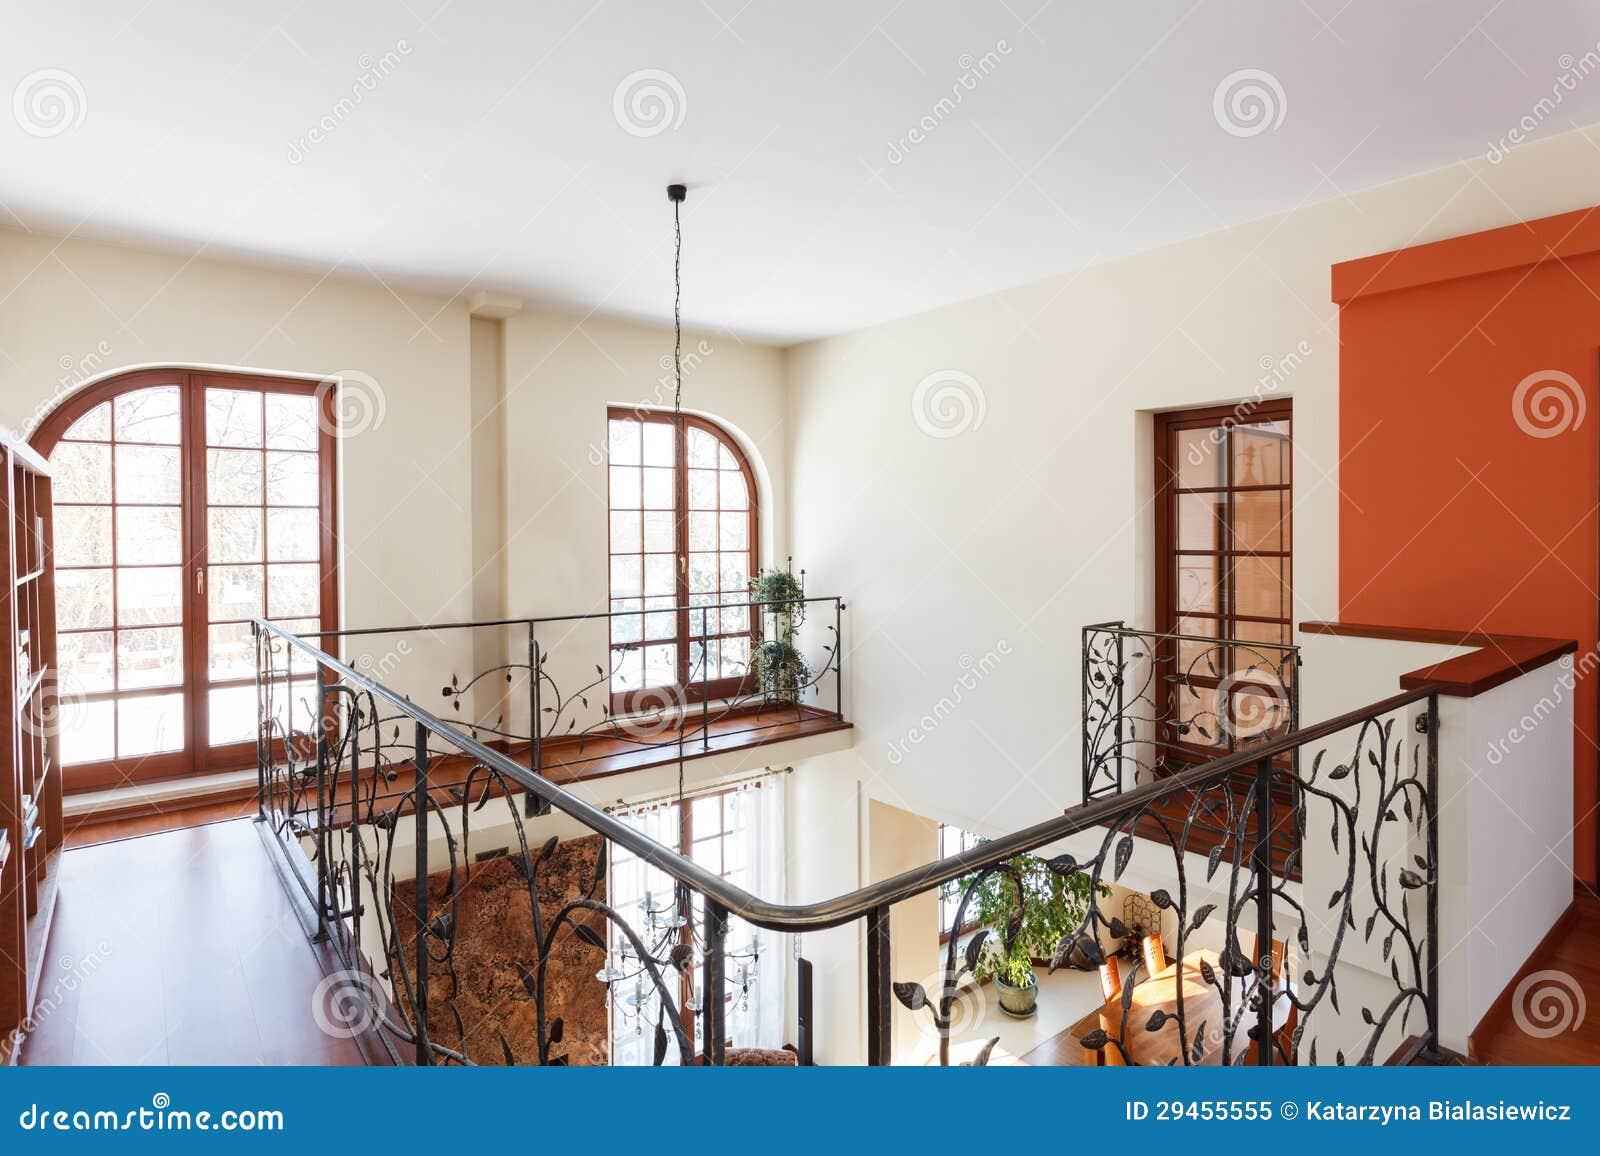 Elegant huis mezzanine stock afbeelding afbeelding bestaande uit huis 29455555 - Huis mezzanine ...